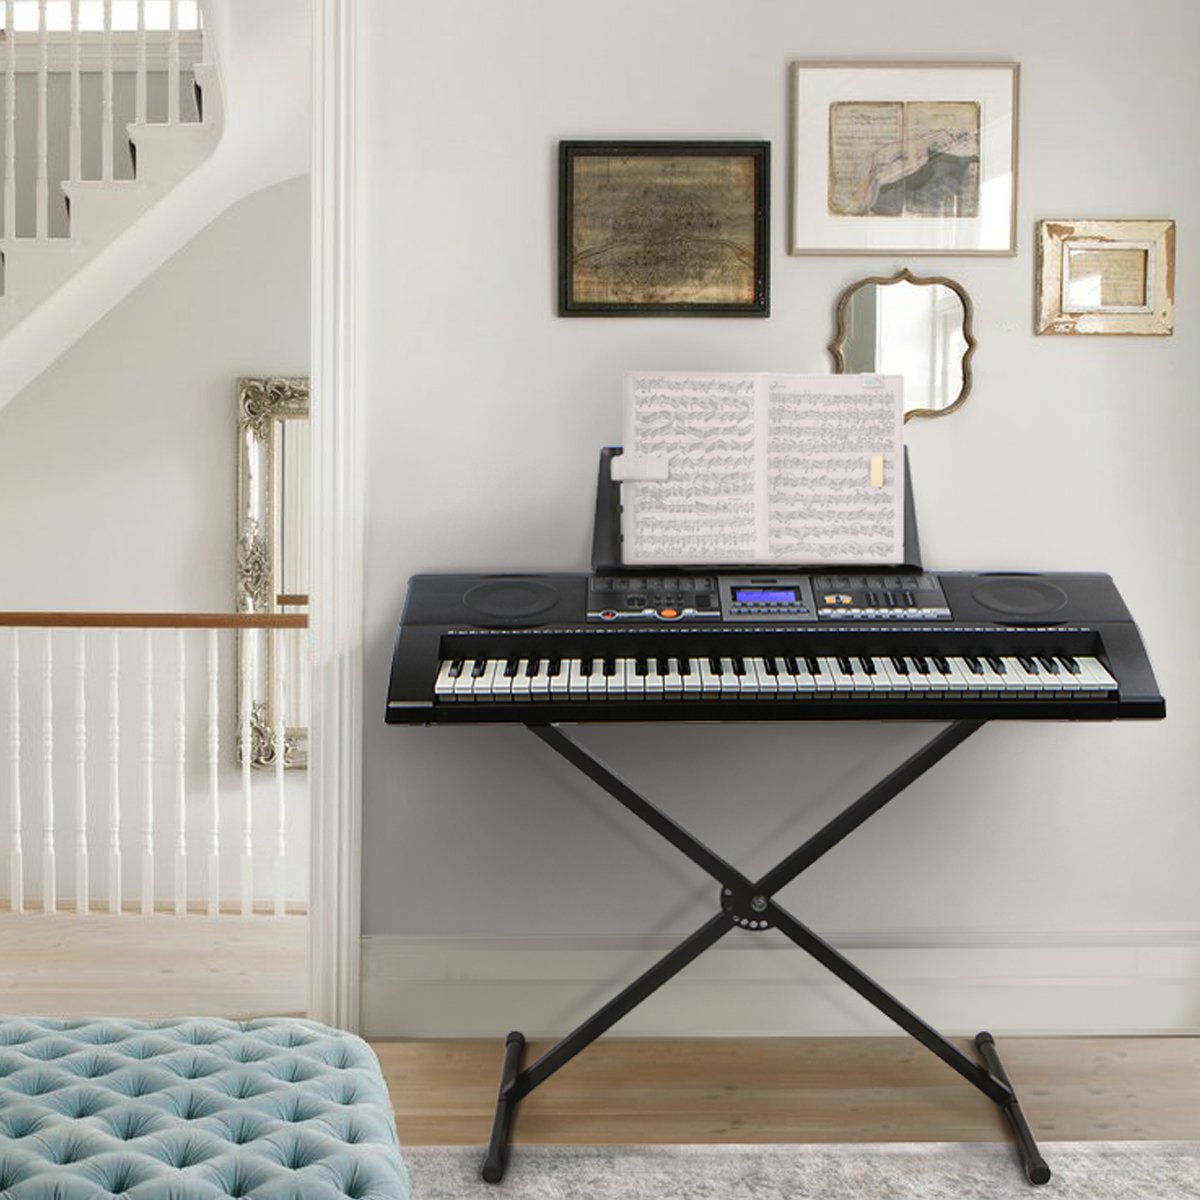 XtremepowerUS 61 Key Electronic Music Keyboard Electronic Piano W/ Stand LCD Display Screen